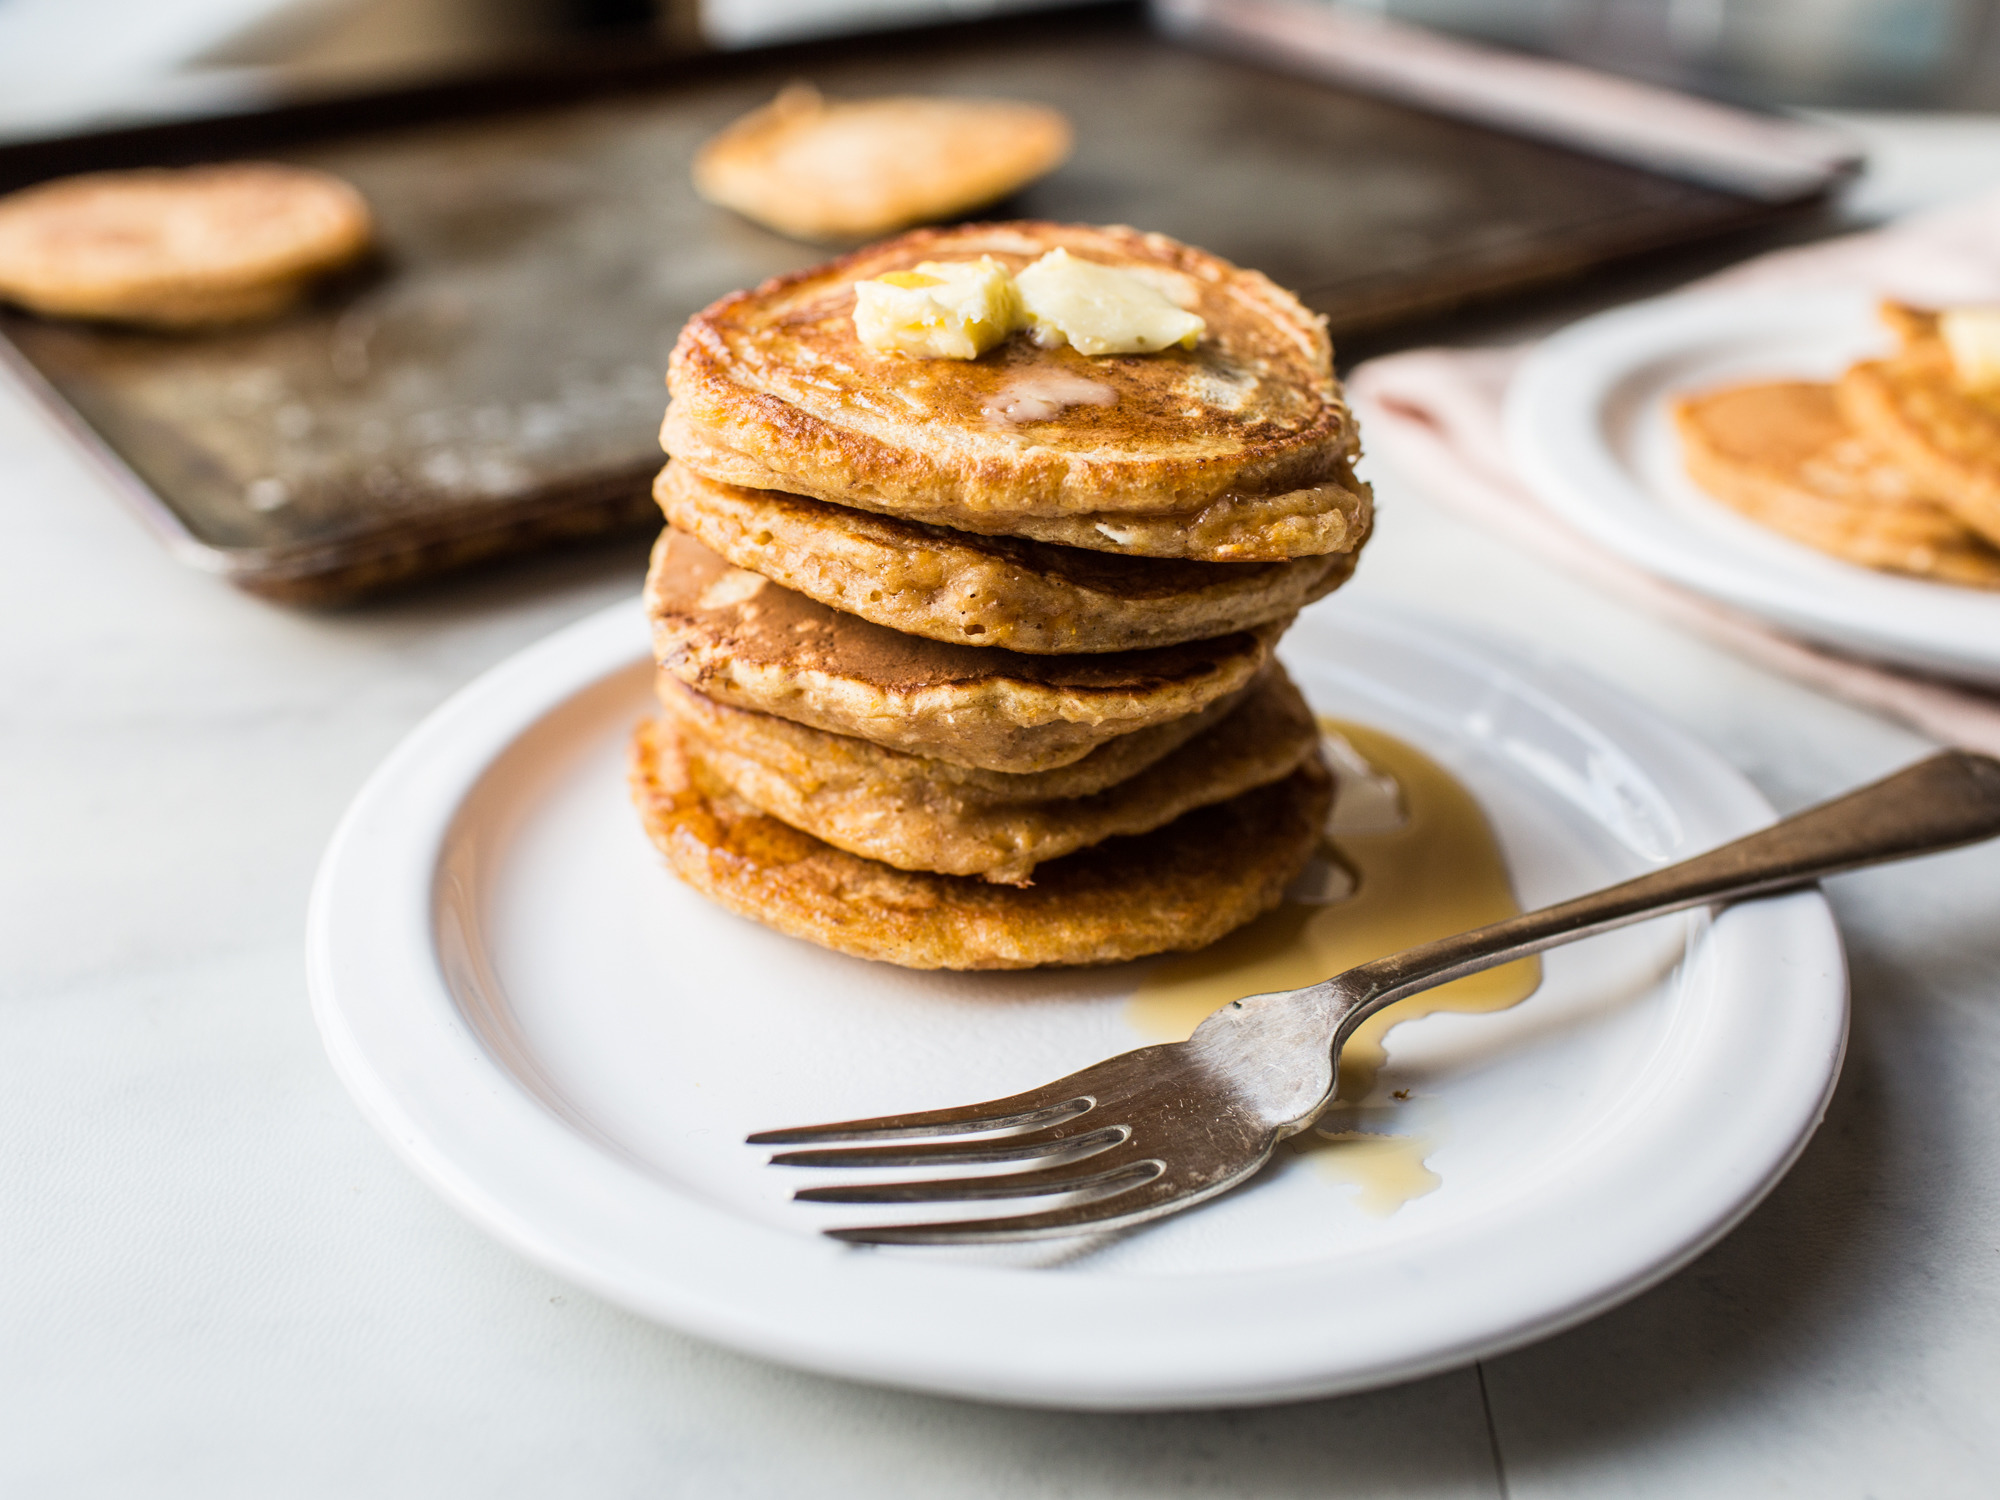 15 Top Pancake & Waffle Recipes